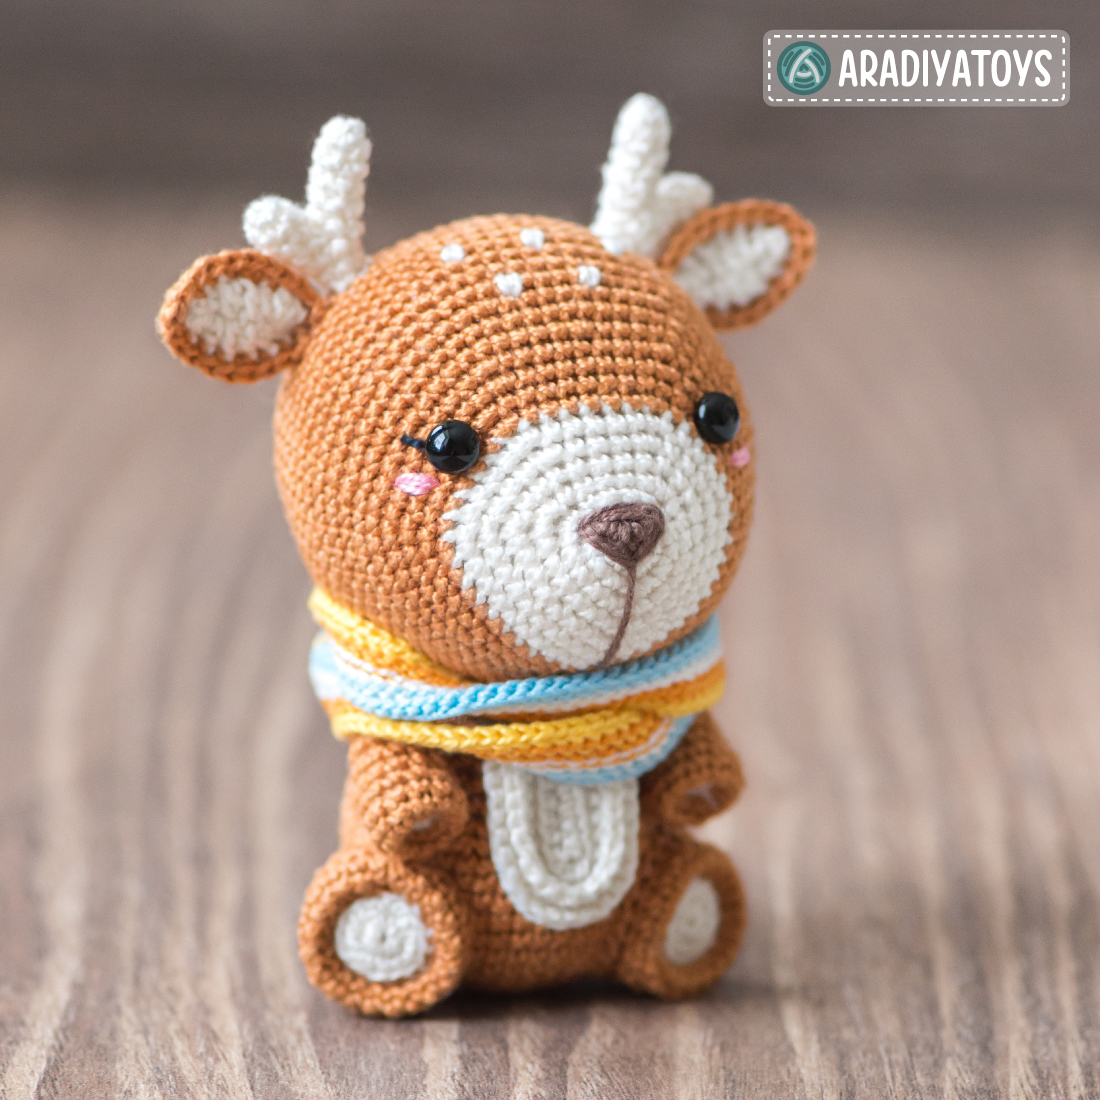 "Modèle au crochet de Kira la Biche de ""AradiyaToys Design"""